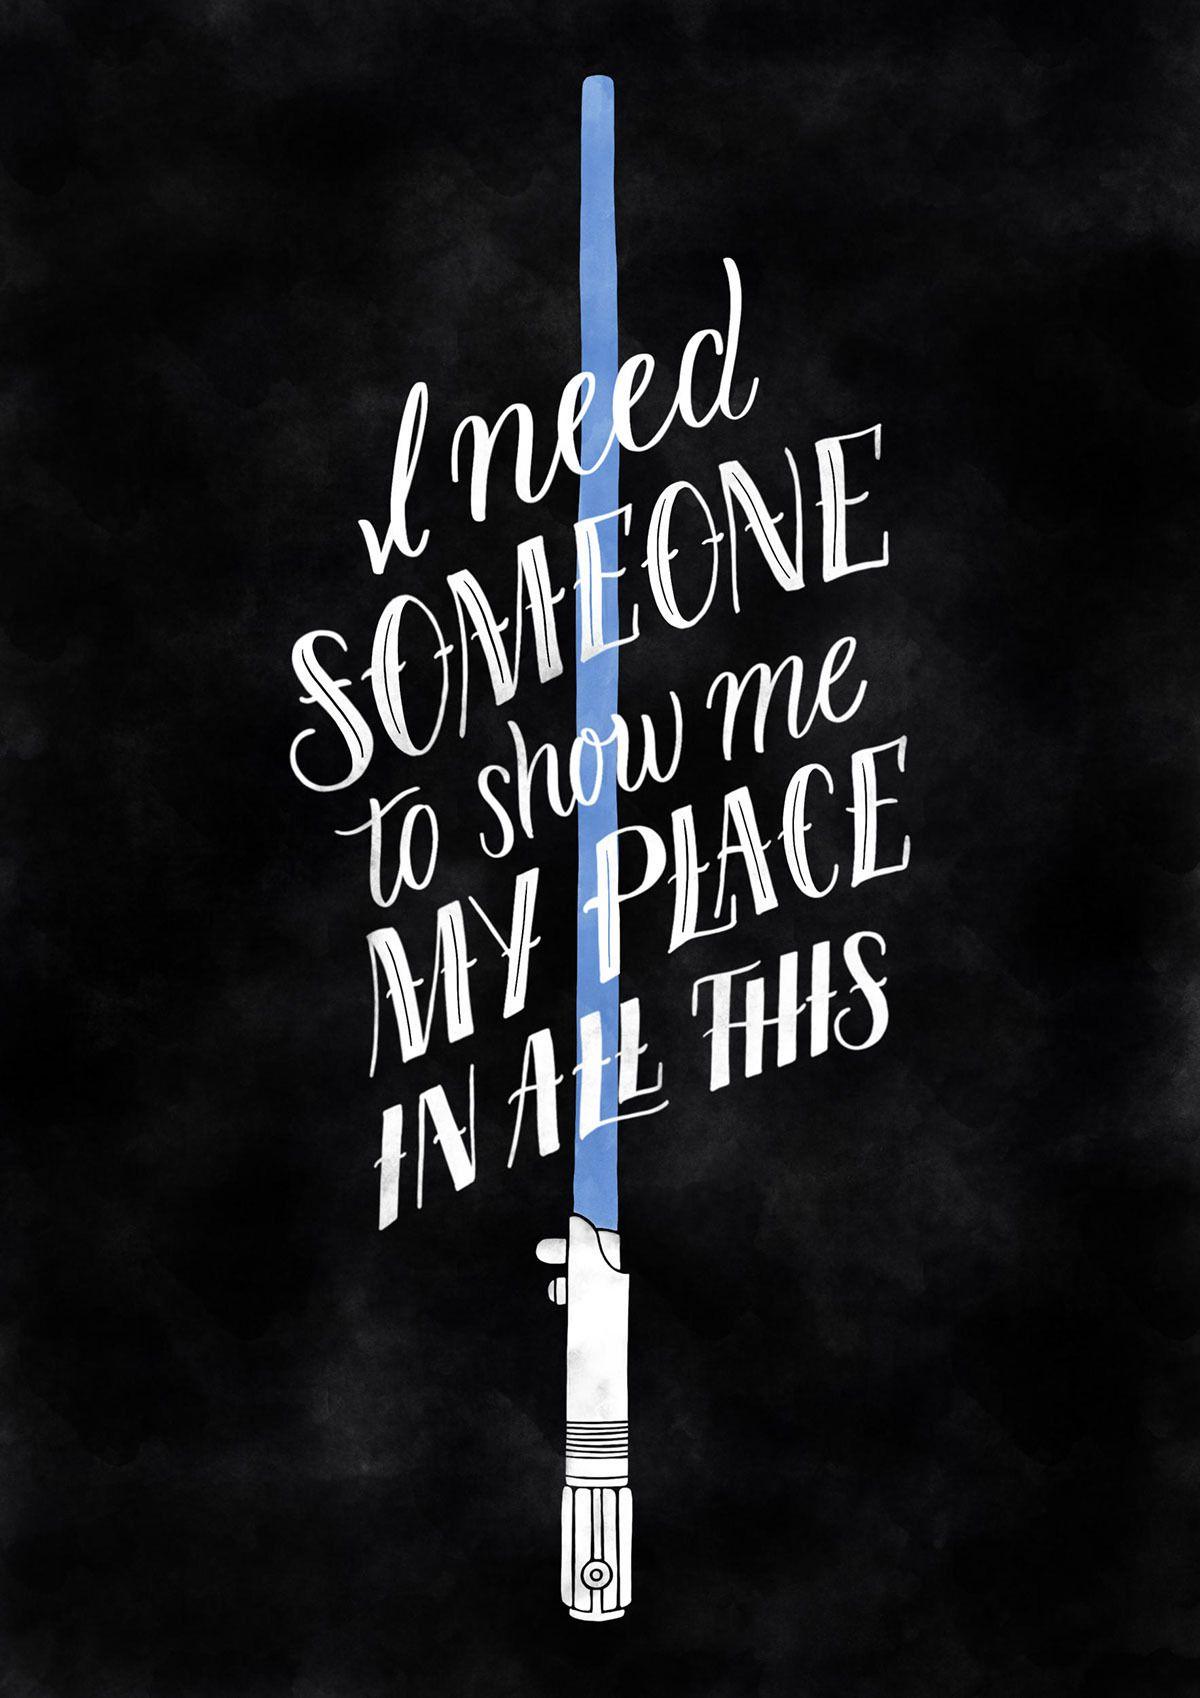 Pin By Chloe Kipling On Star Wars Star Wars Quotes Star Wars